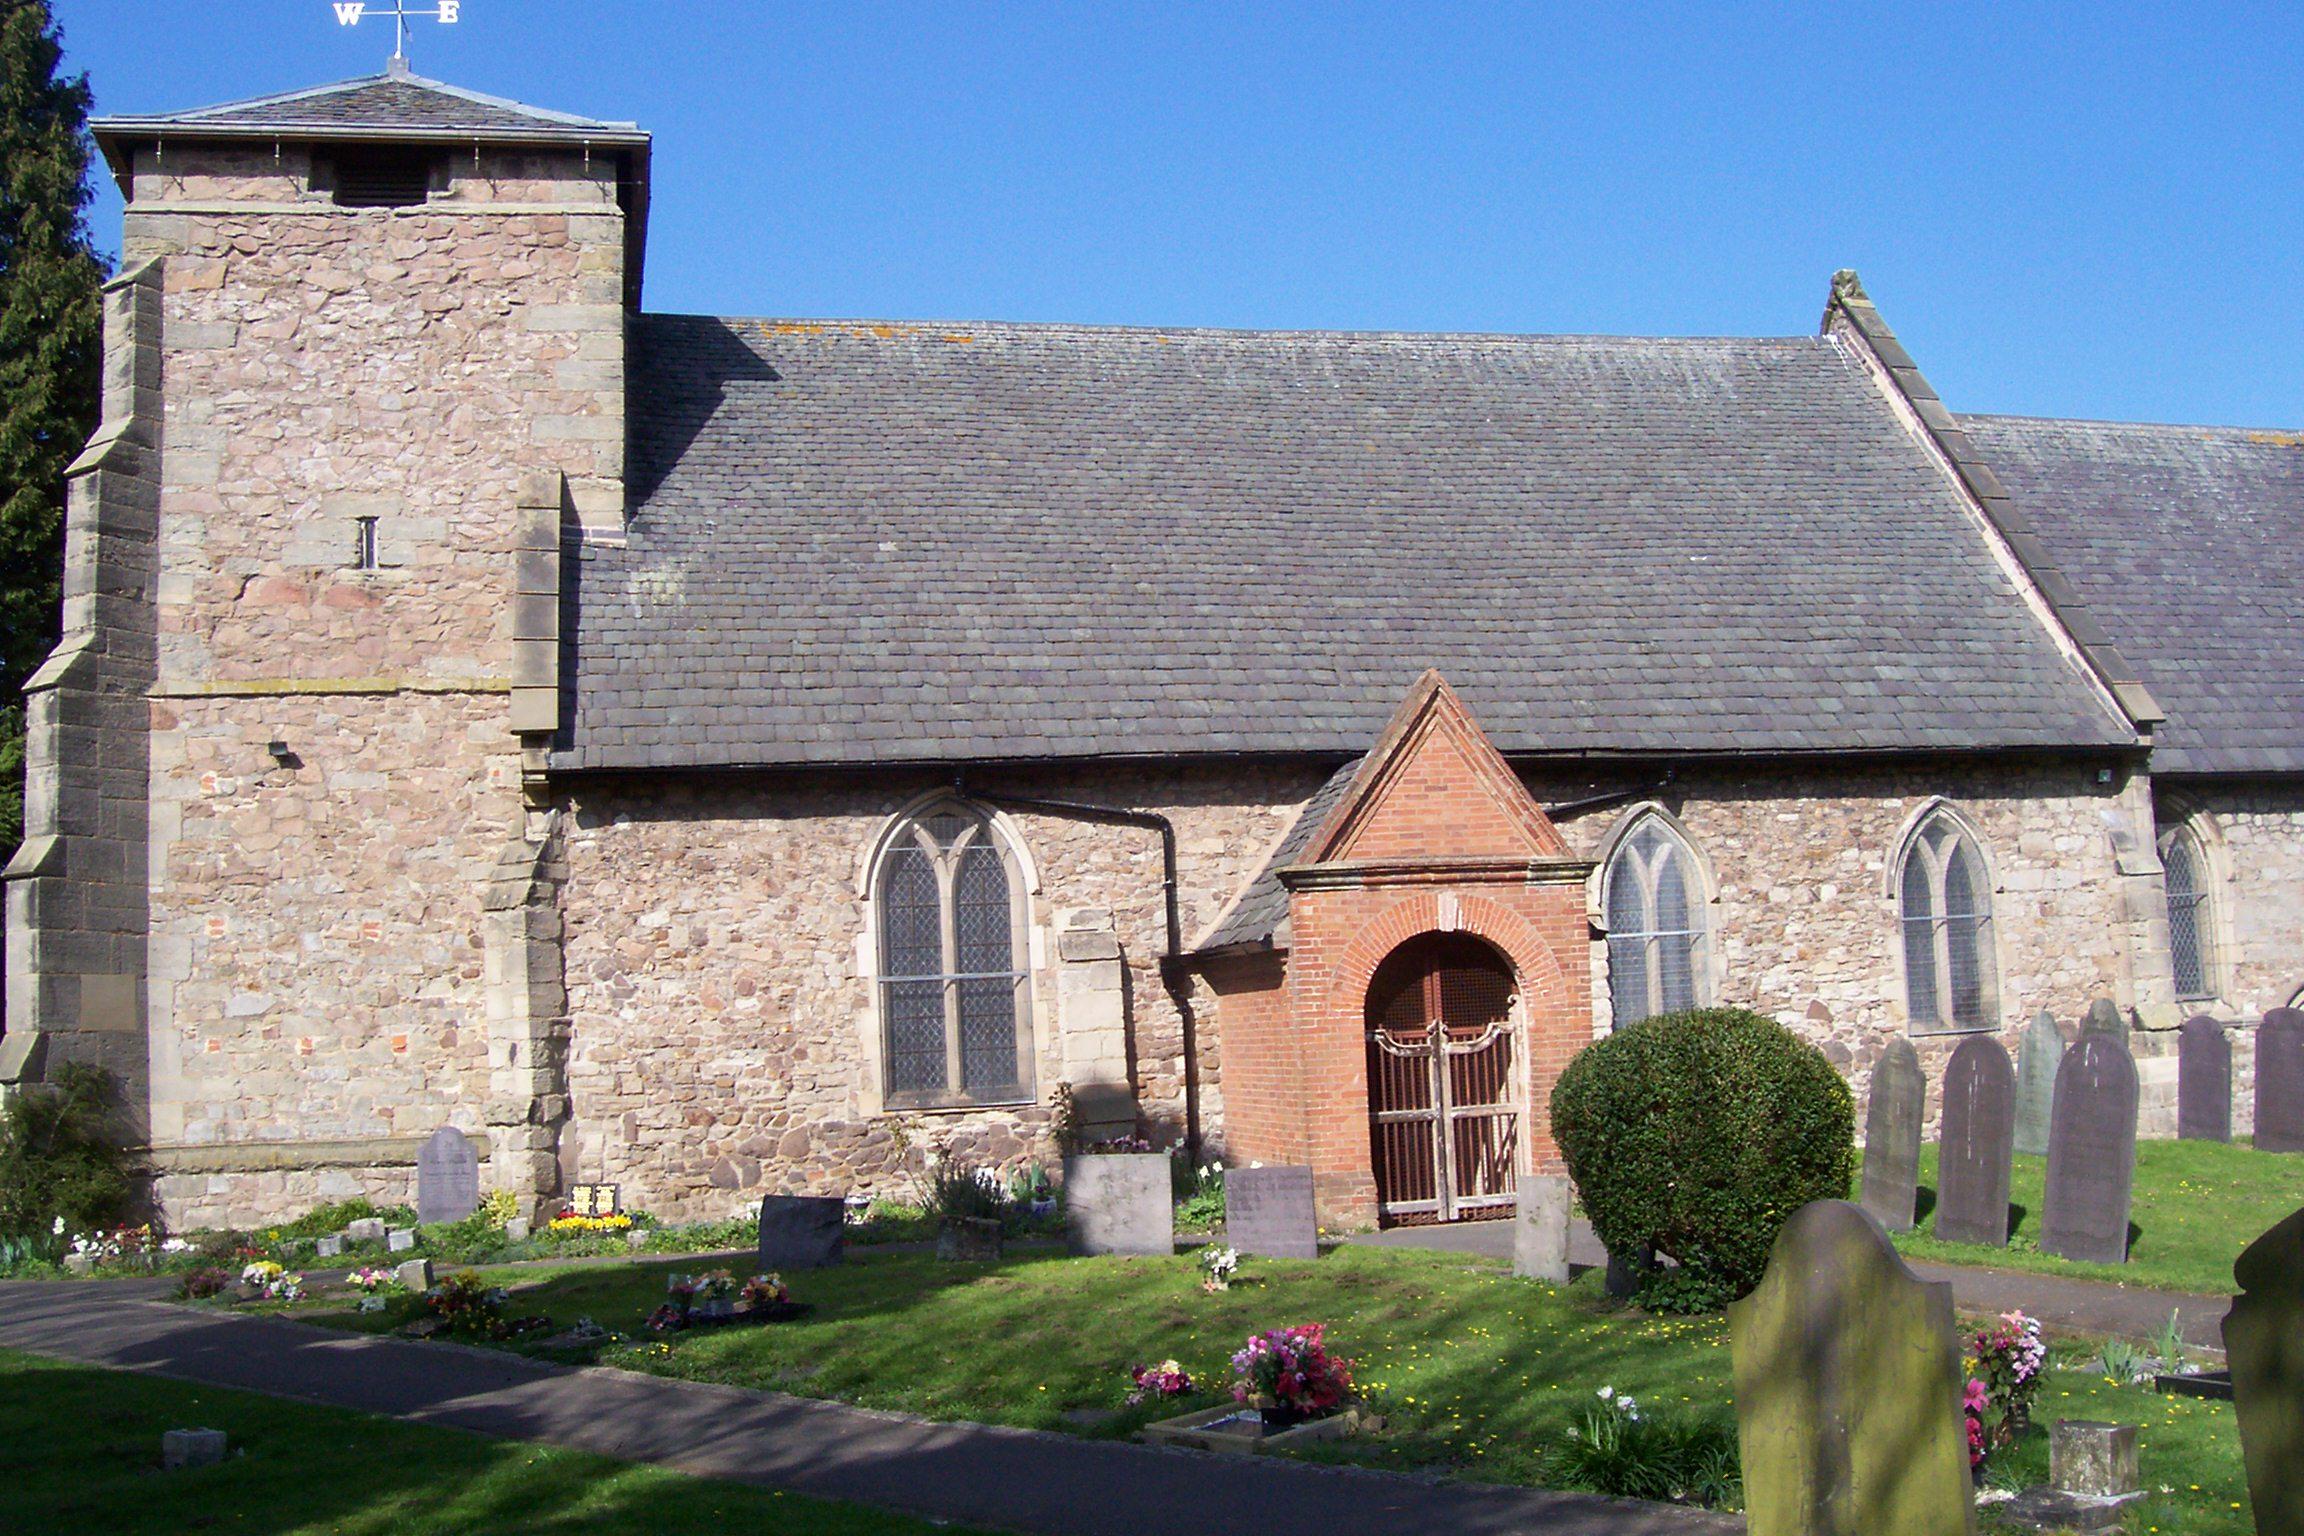 St. Peter's, Braunstone